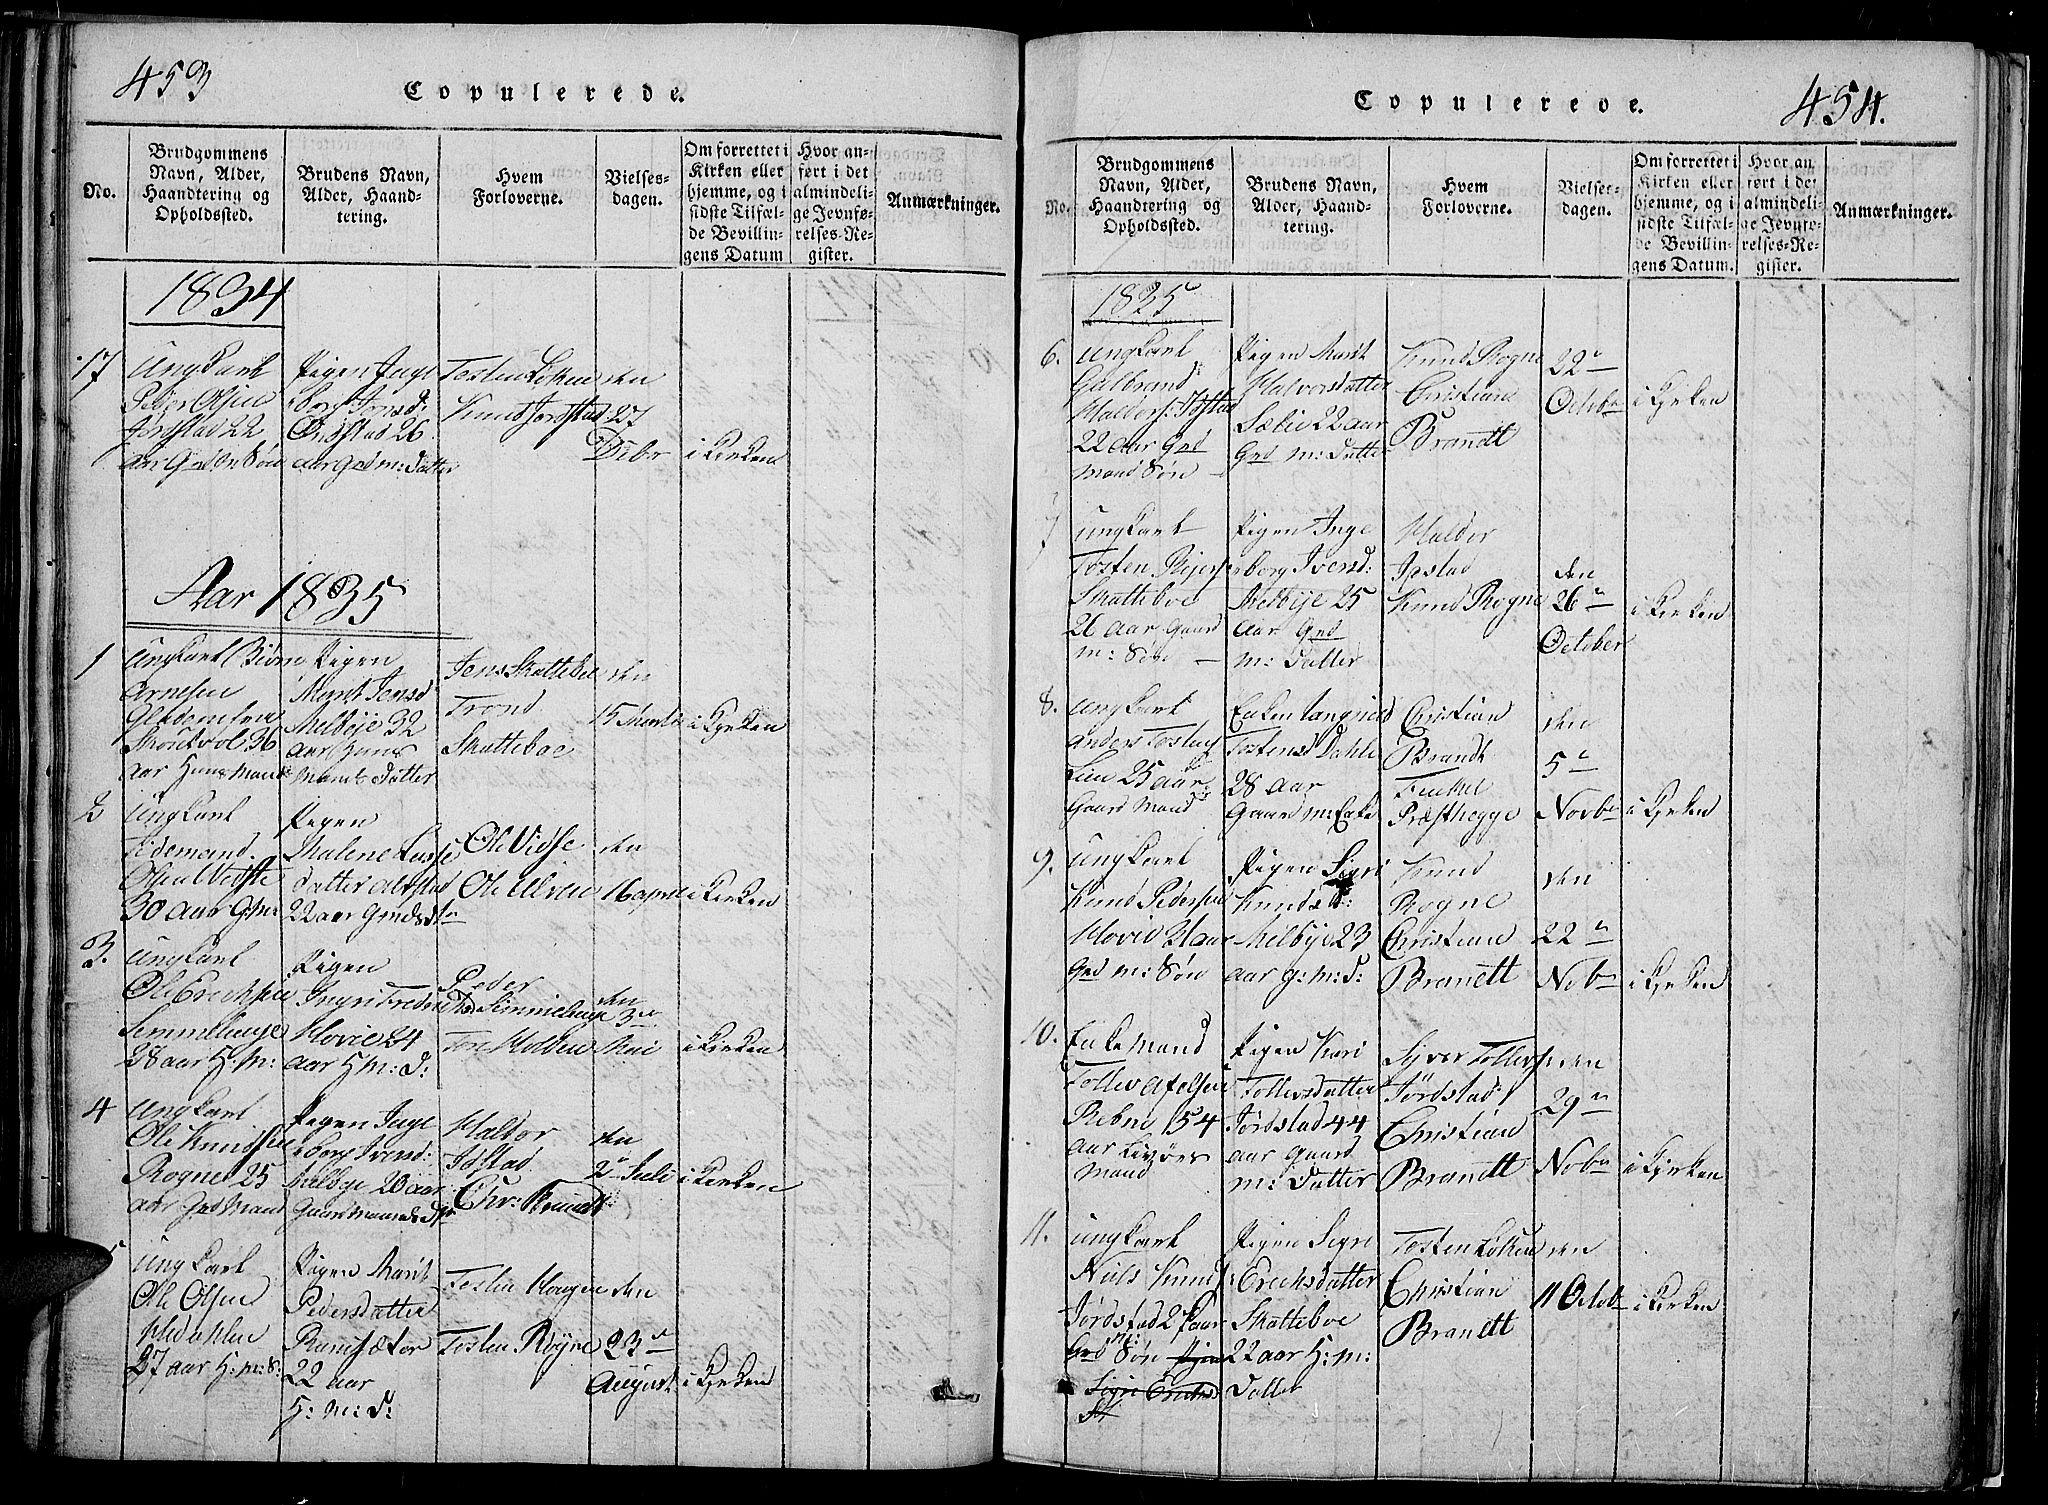 SAH, Slidre prestekontor, Klokkerbok nr. 2, 1814-1839, s. 453-454